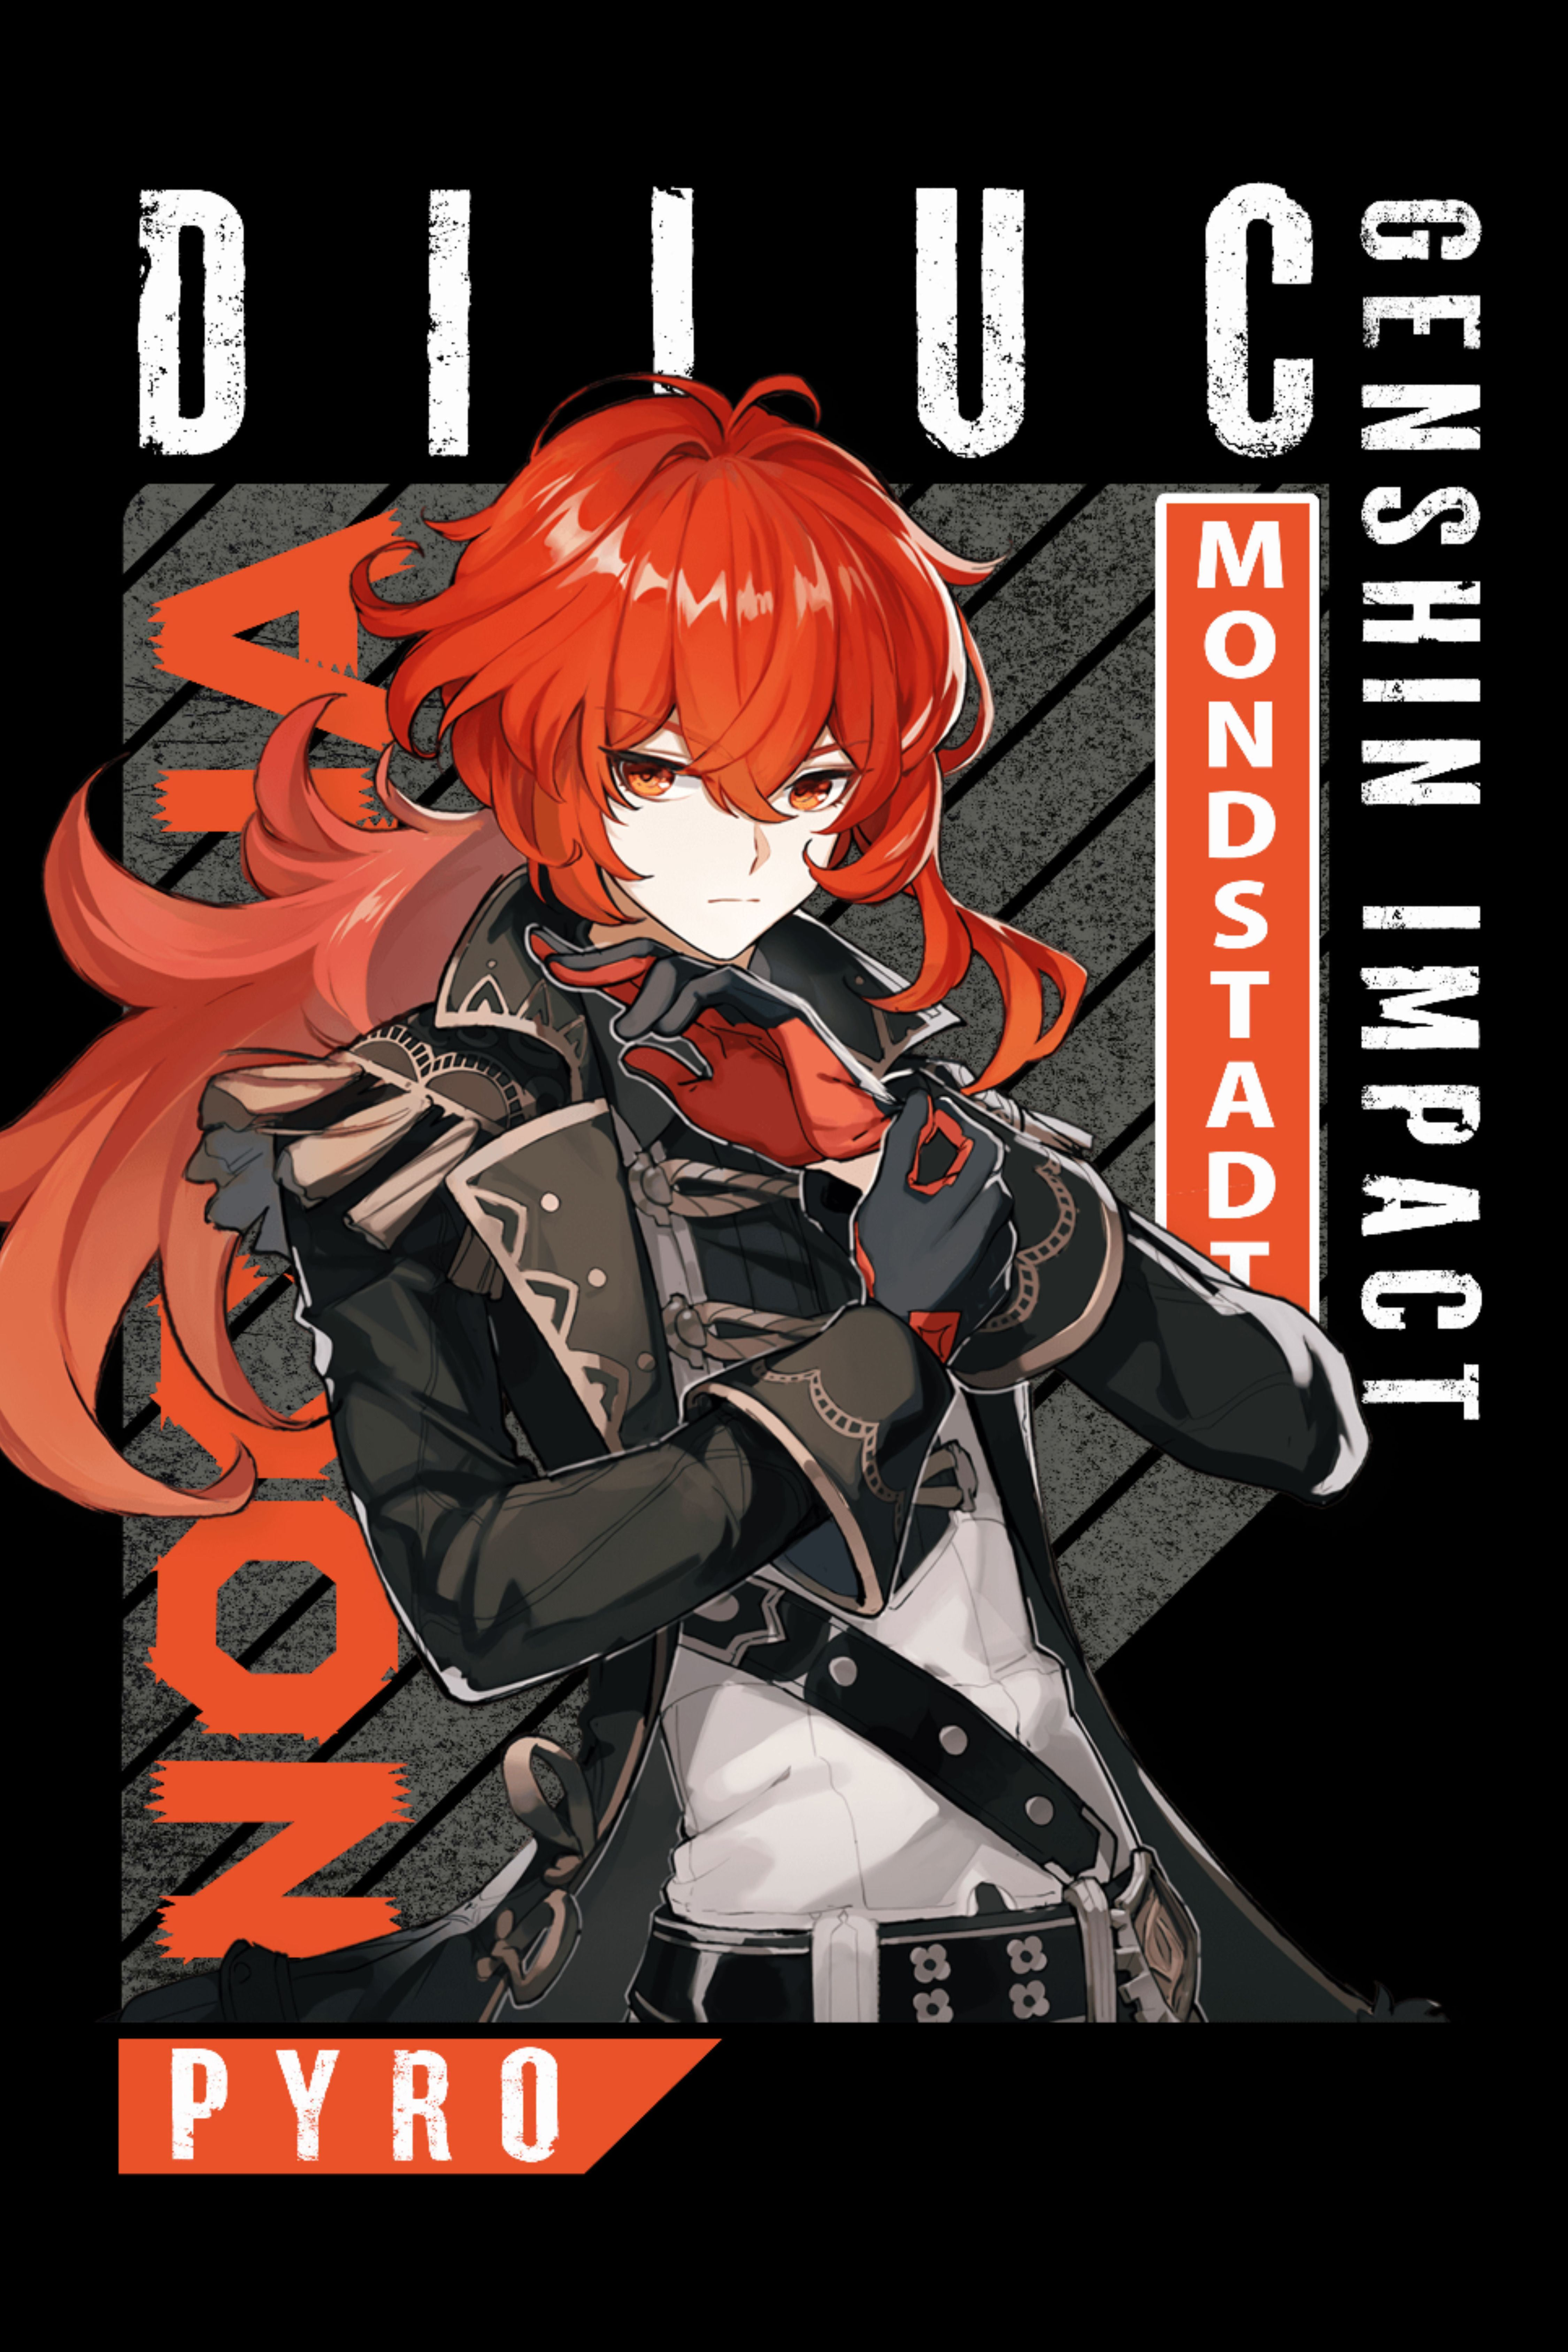 Diluc Genshin Impact Characters Anime Manga Art Poster